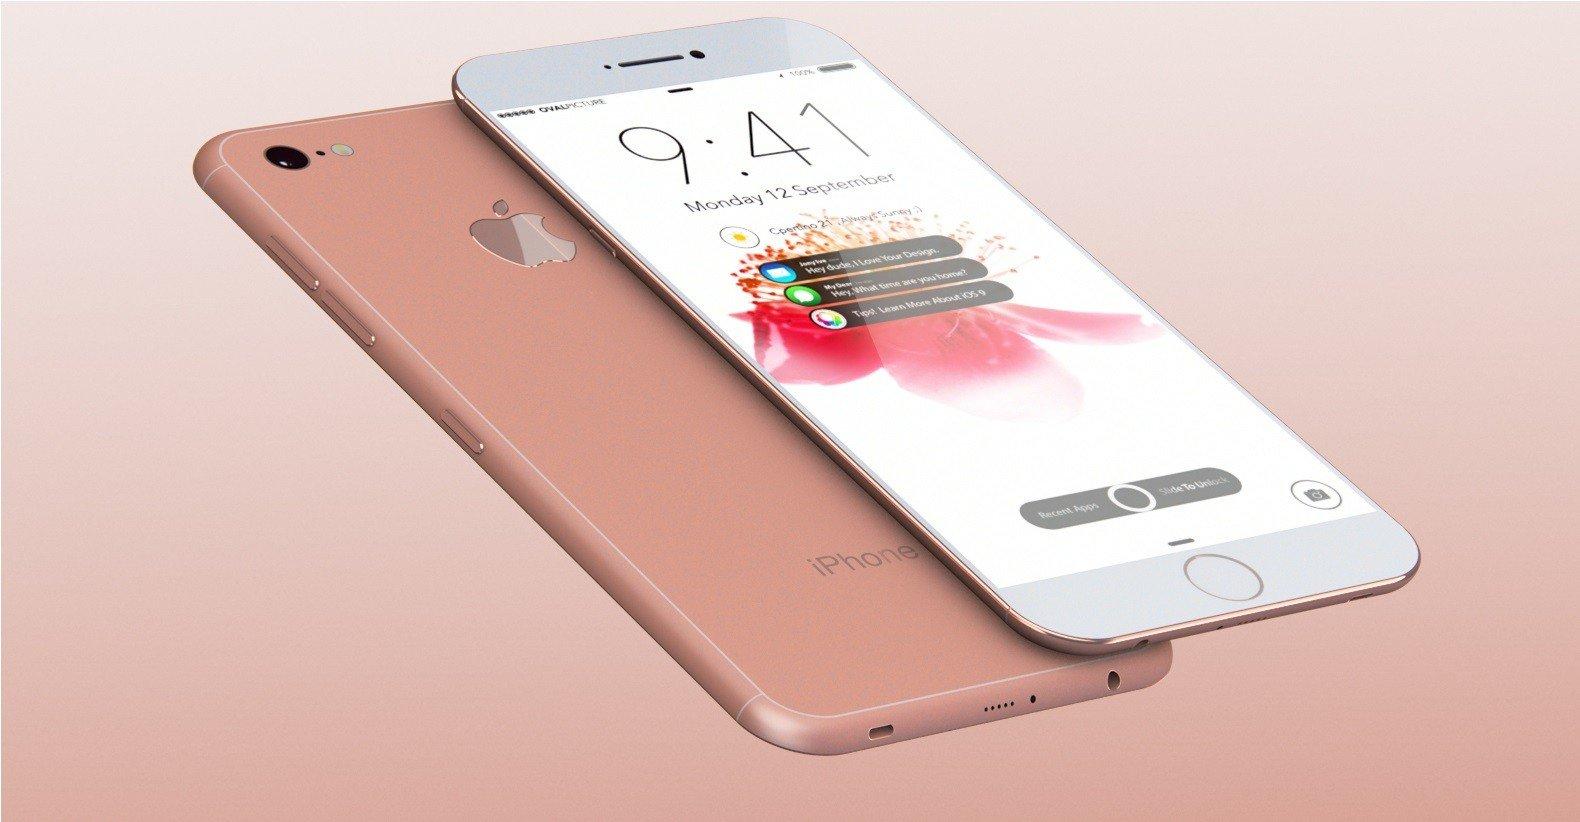 iPhone 7 пользуется меньшим спросом, чем iPhone 6 и iPhone 6